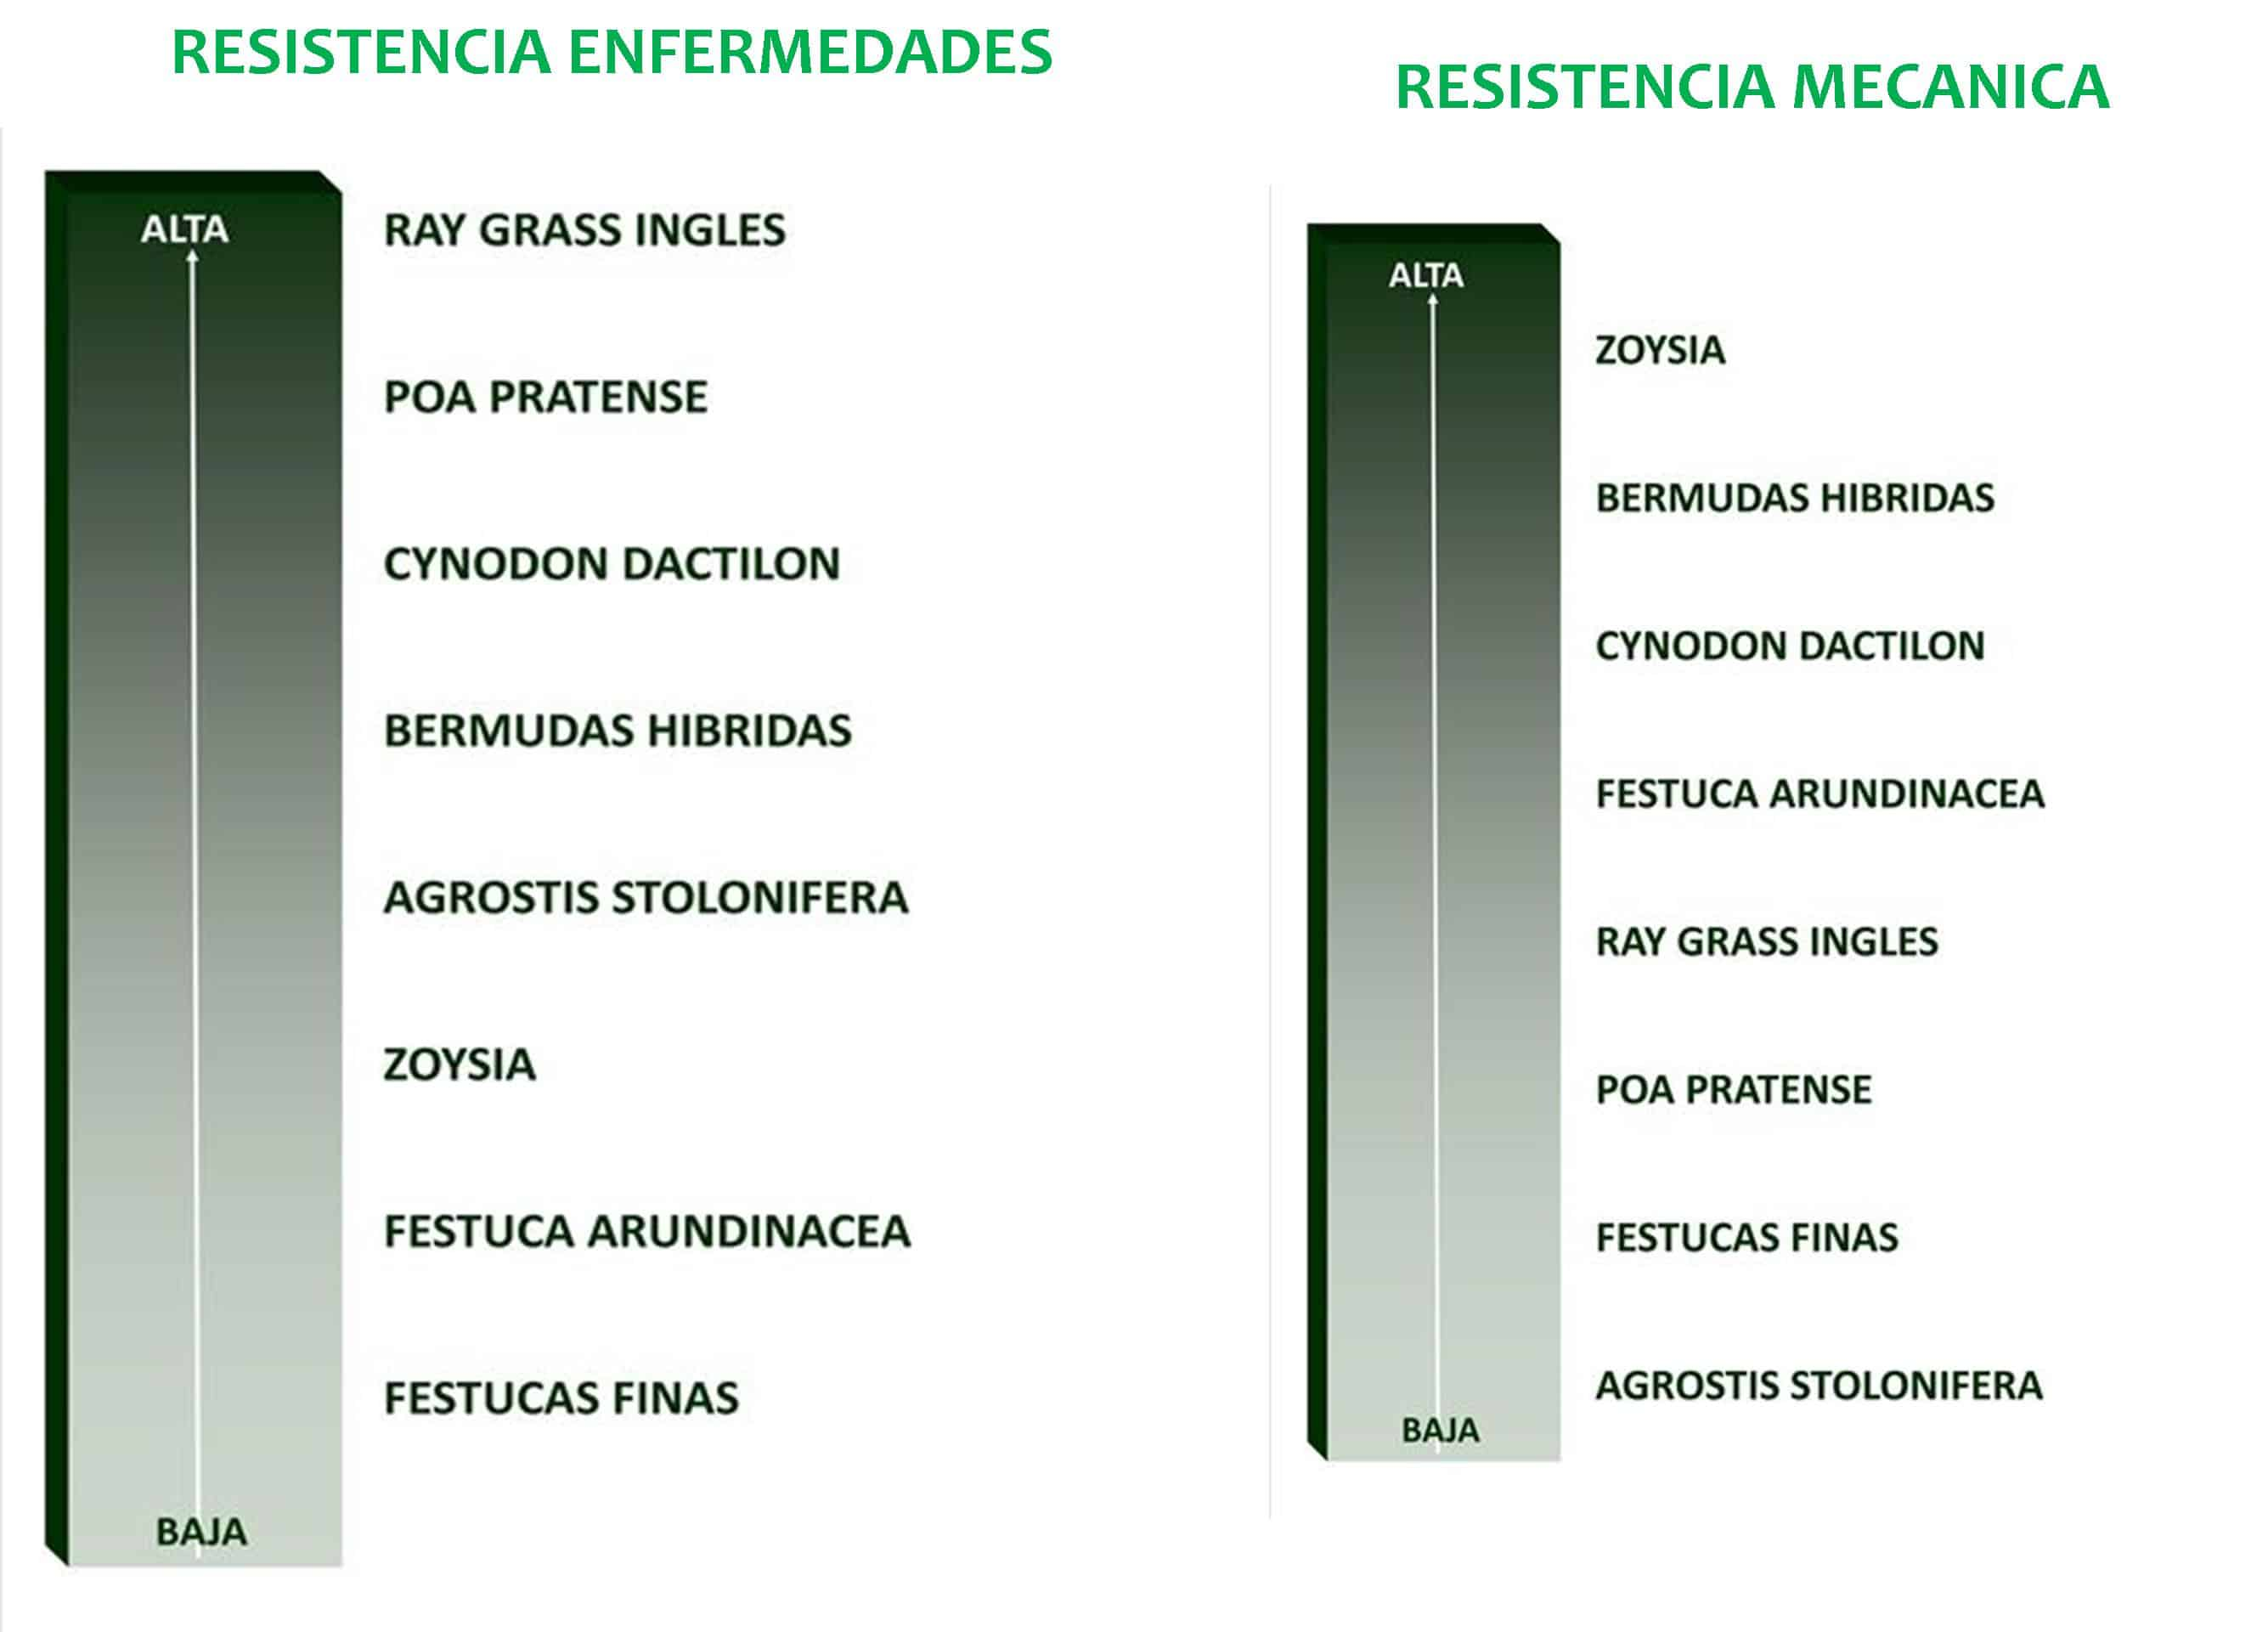 ENFERM_MECANICA